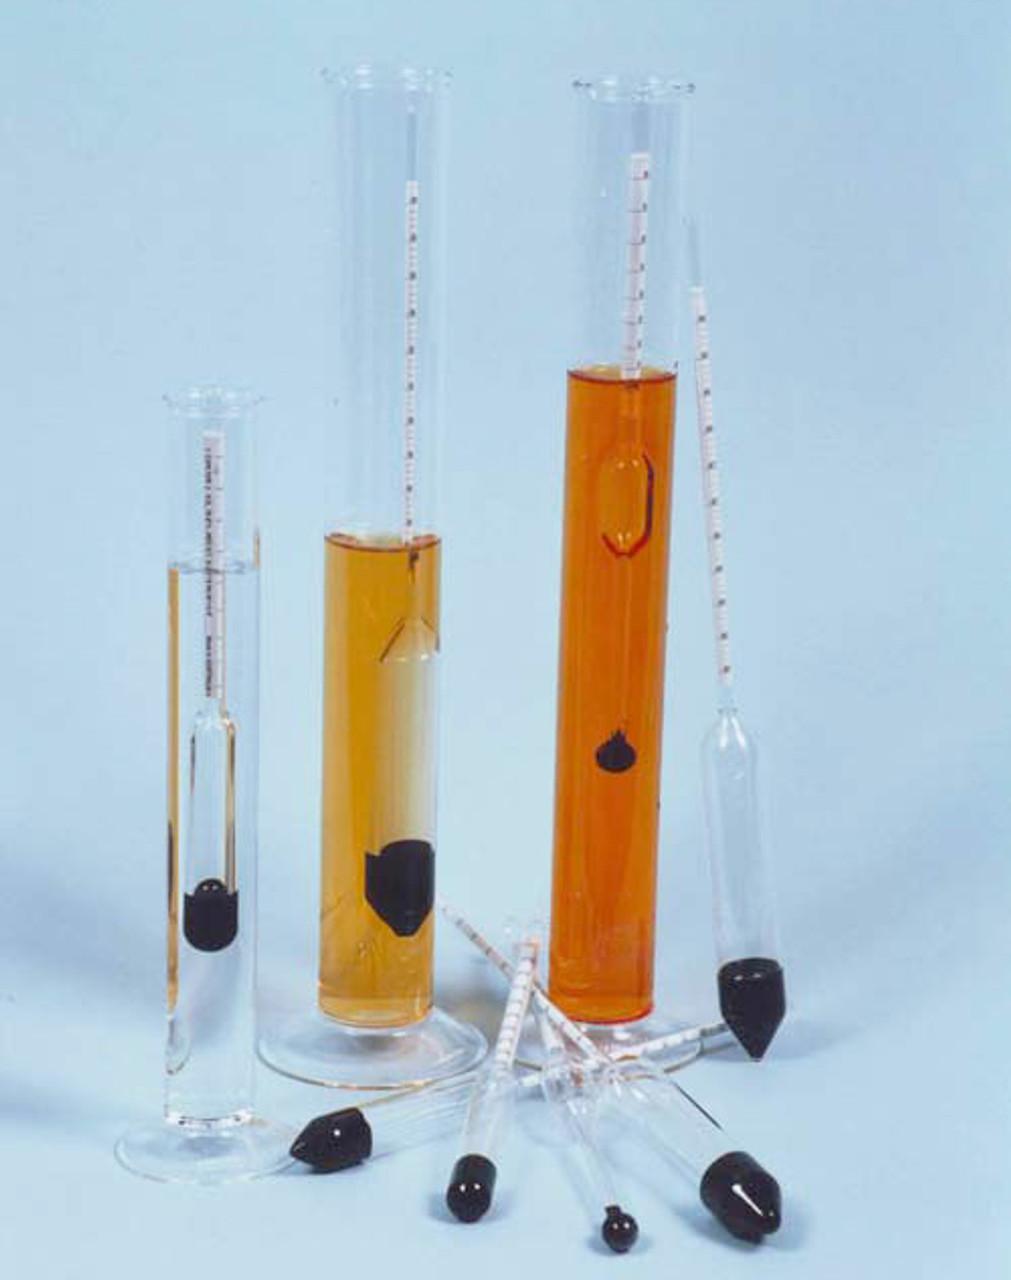 Plato Hydrometer 15-20 x 0.1% ± 0.1 @ 20°C, 315mm